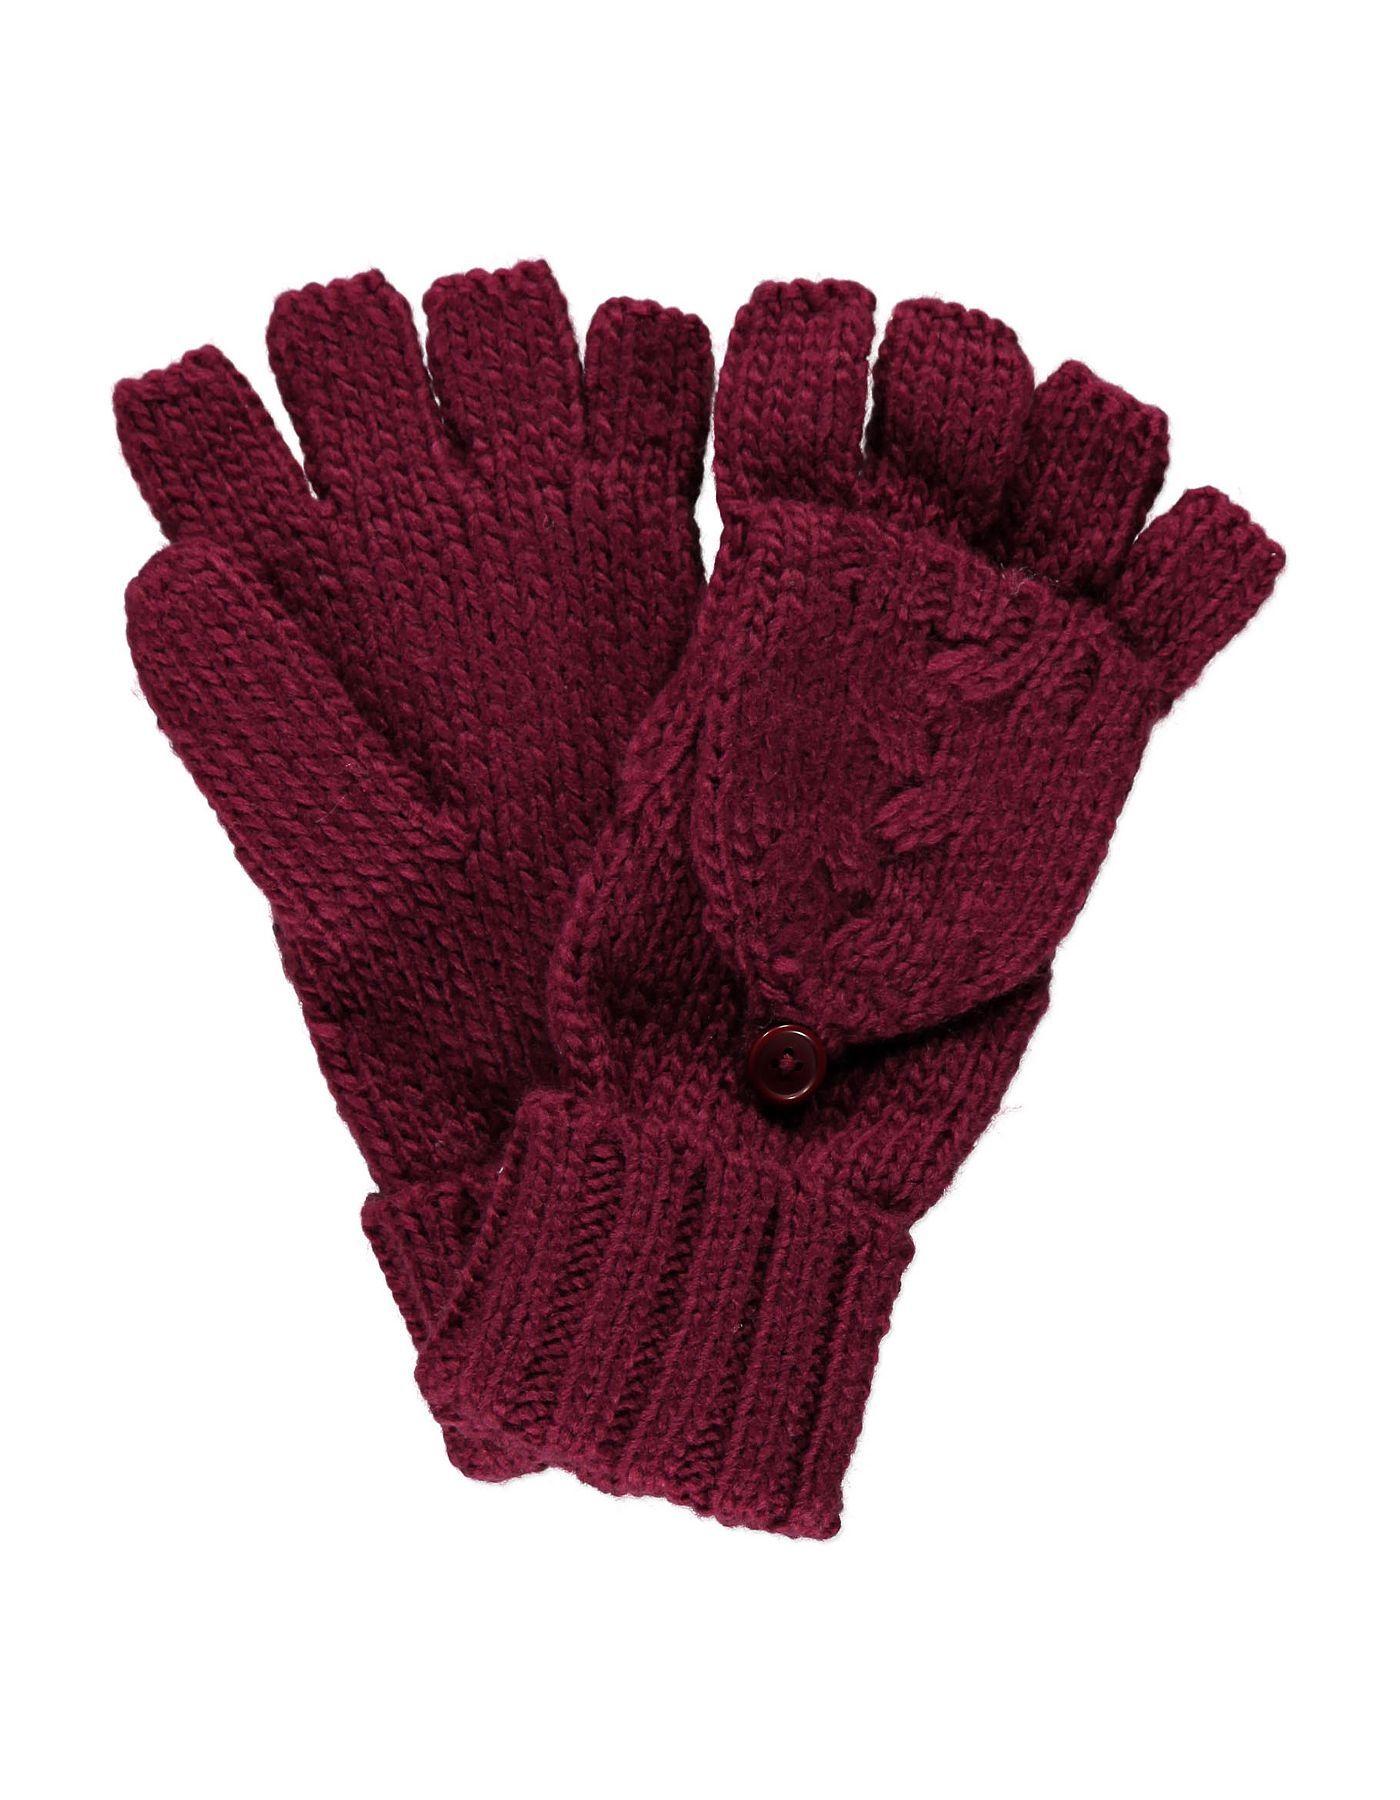 Fingerless gloves women george at asda love this colour